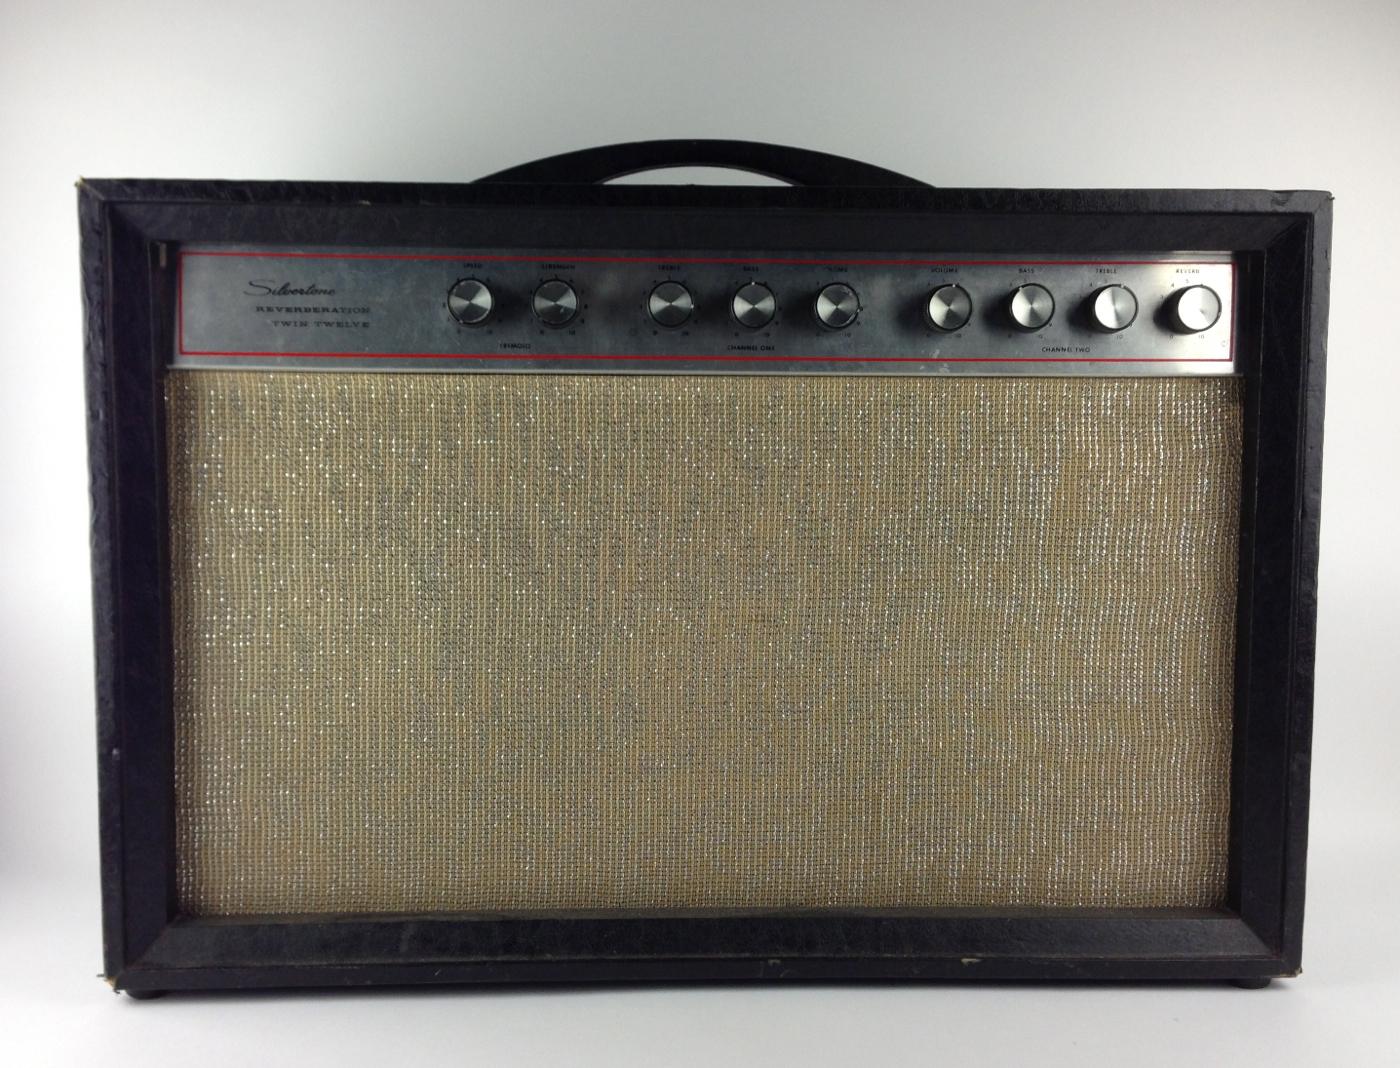 Vintage Silvertone Amps - Beautiful Latin Ass